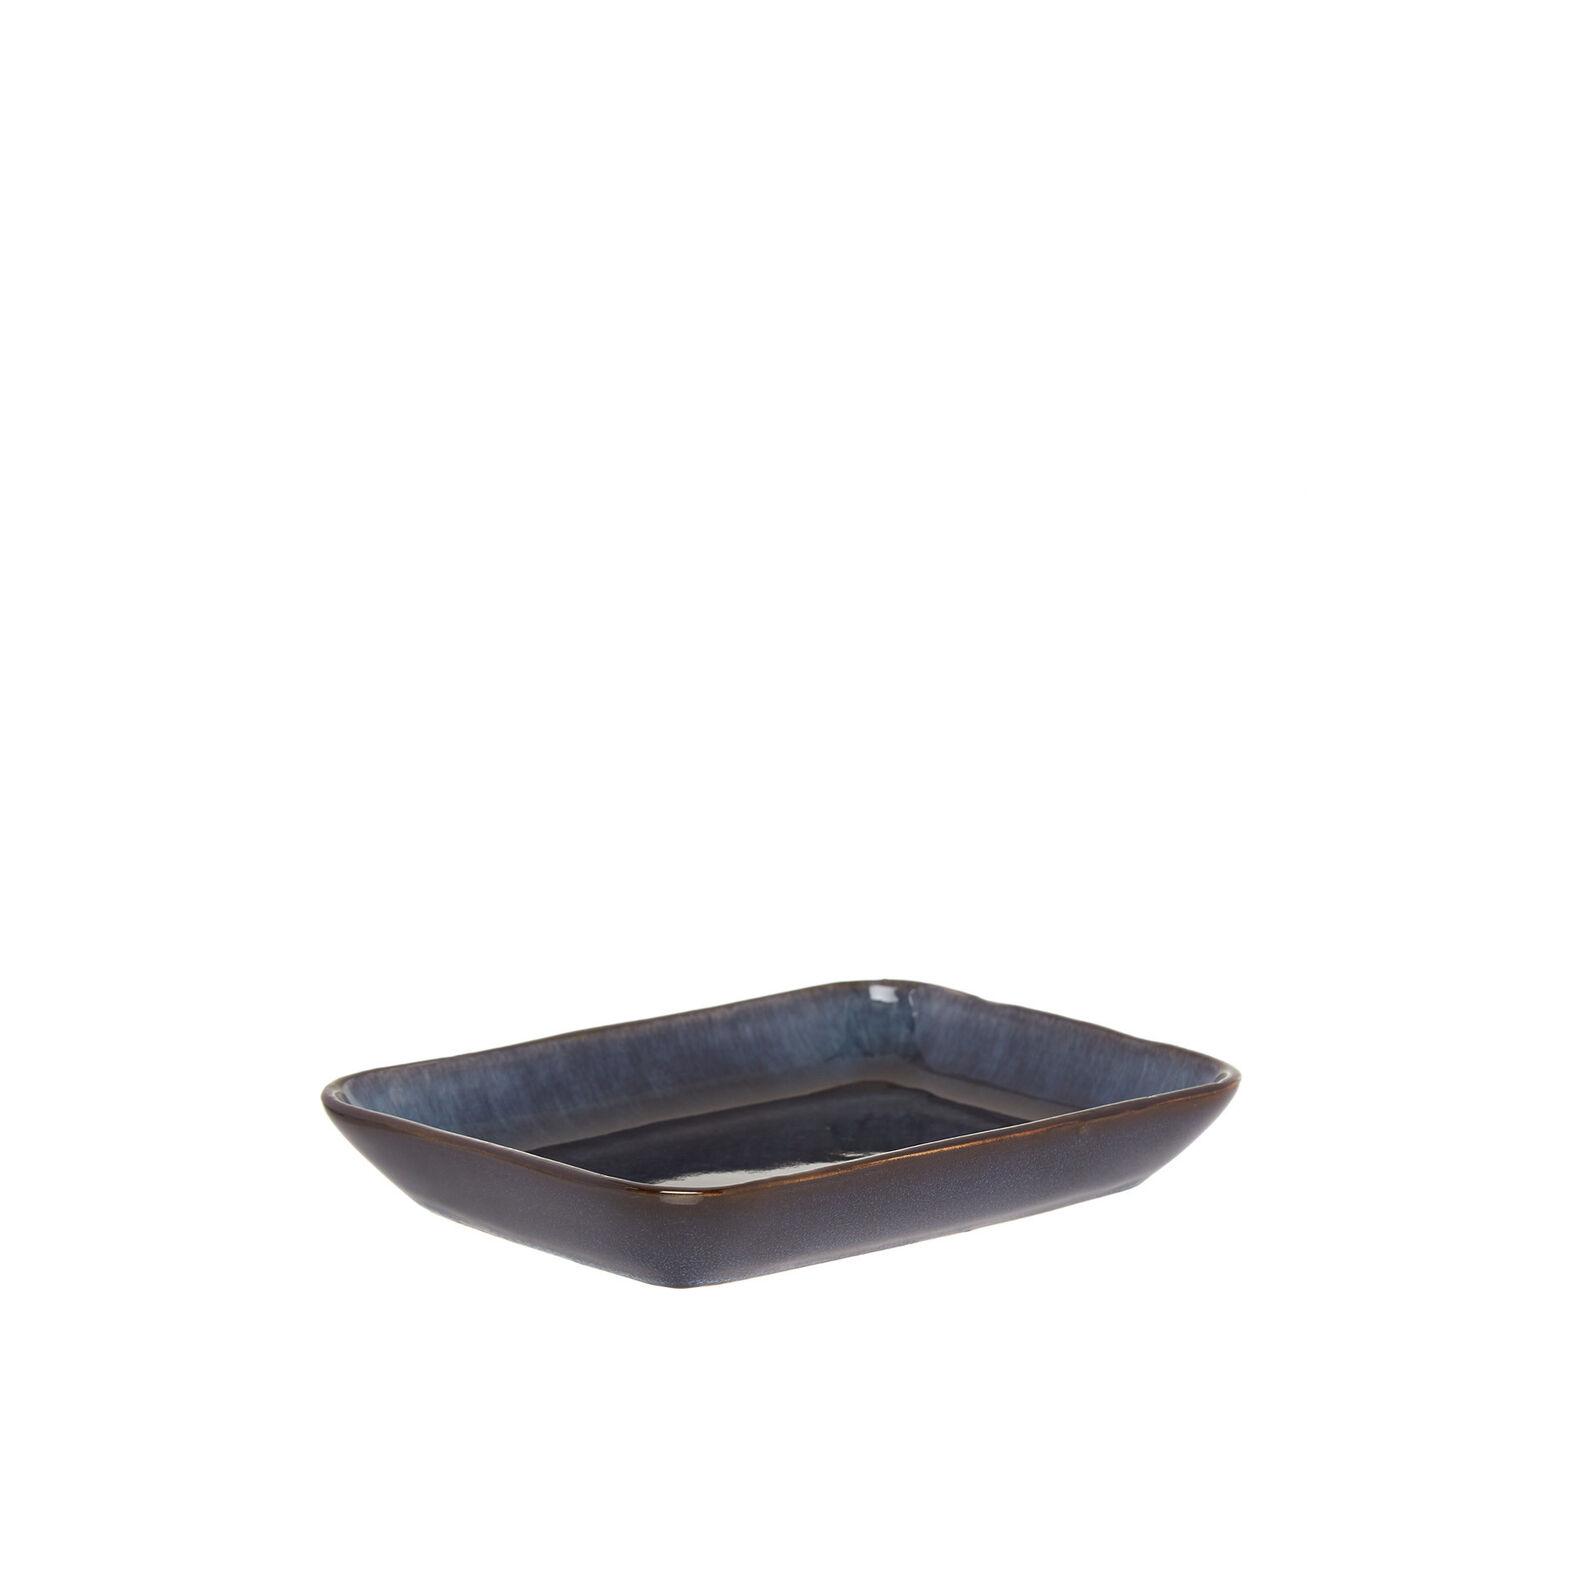 Stoneware saucer with reactive glaze finish.